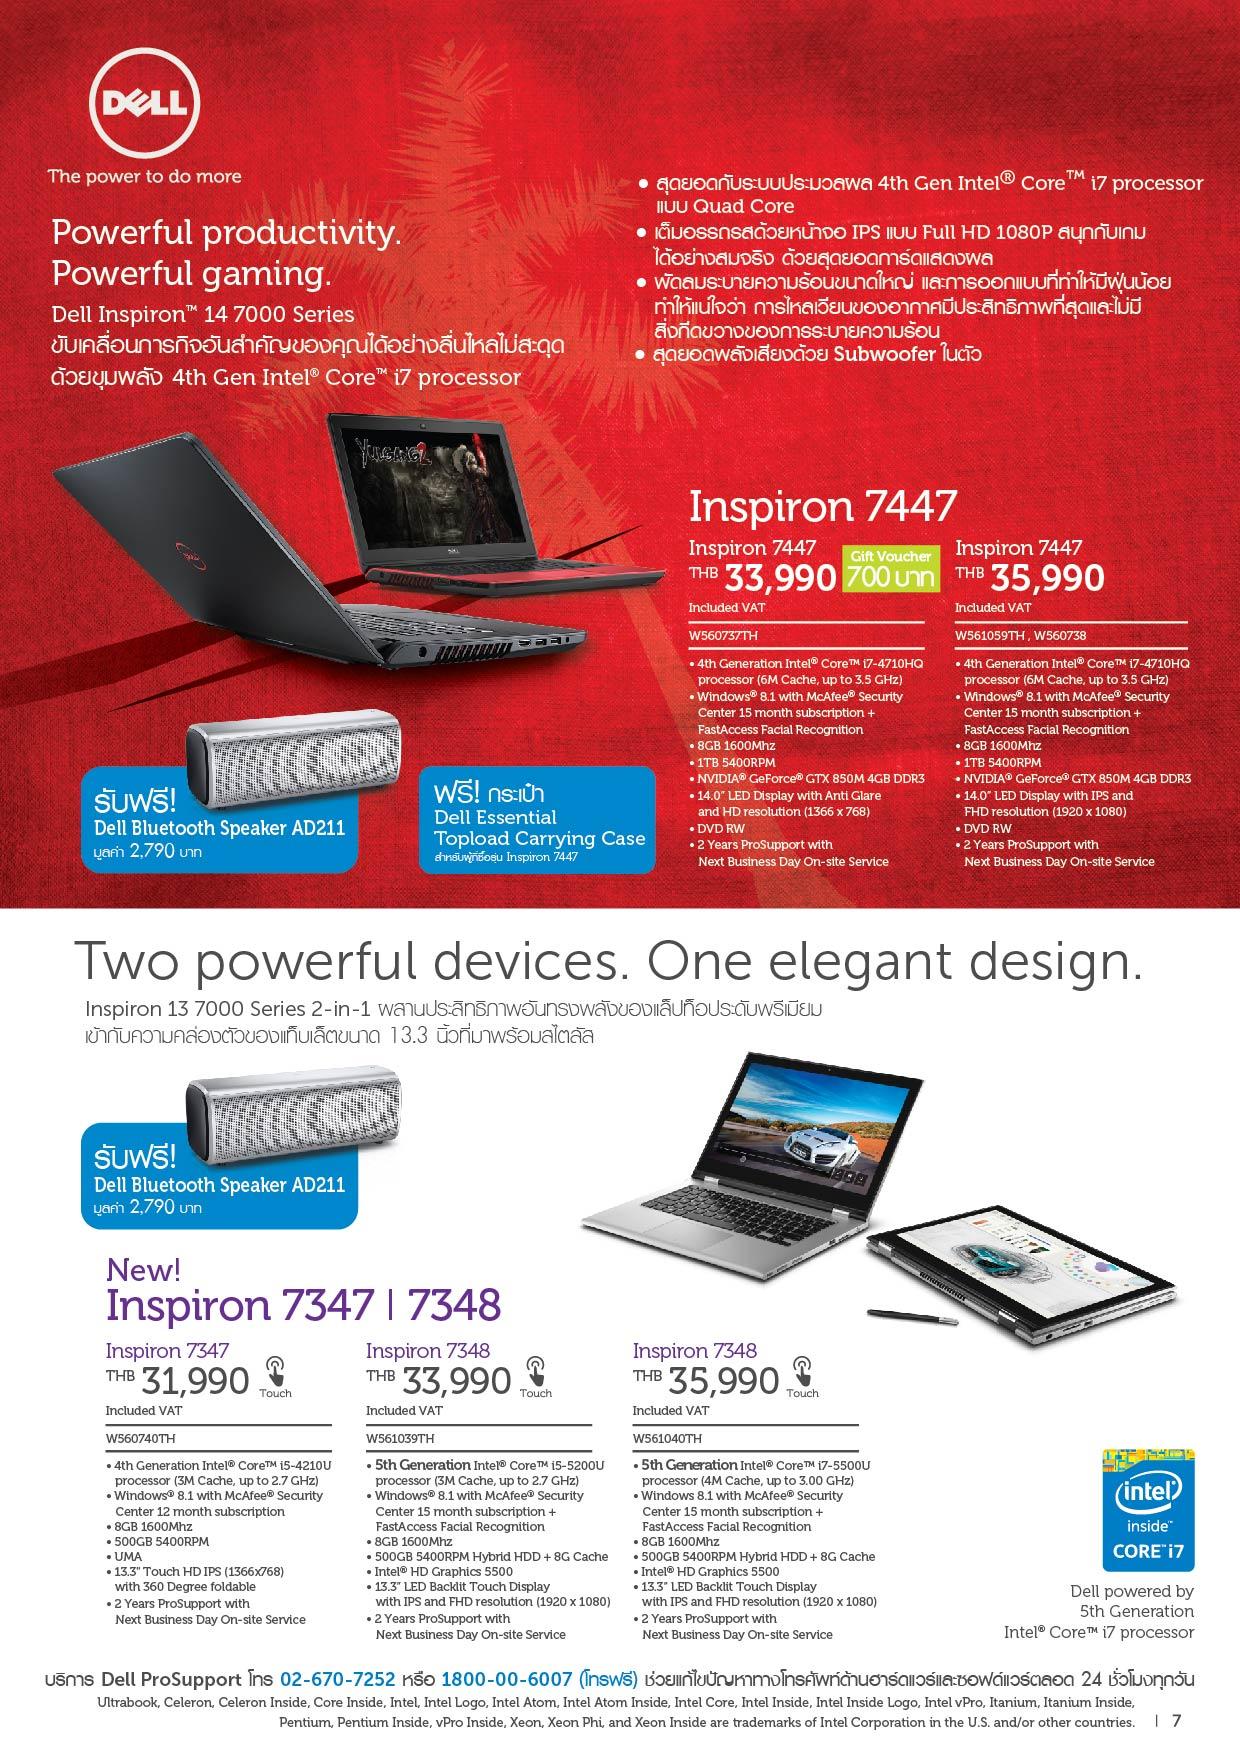 Dell Brochure Mar-Apl 58 Page 7-01